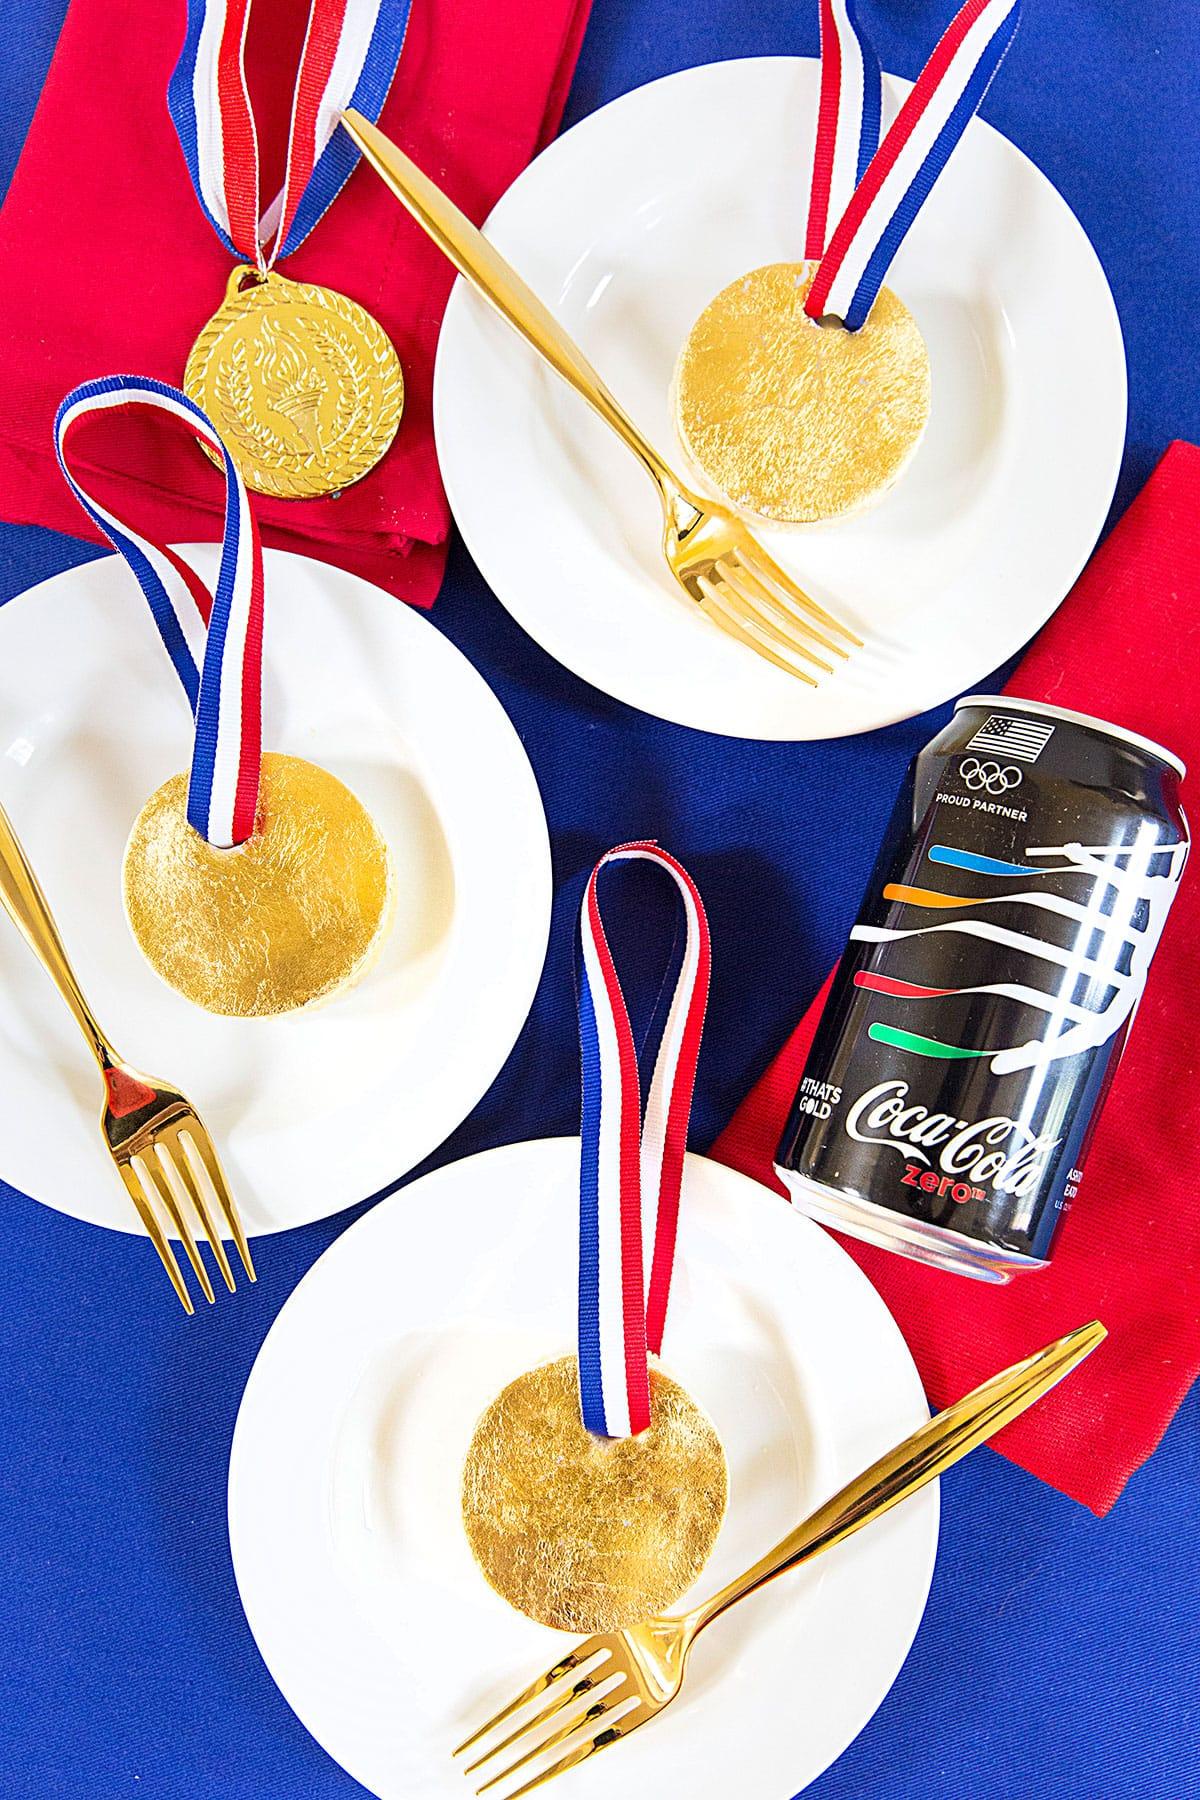 Mini Gold Medal Cakes, Olympics Treat!